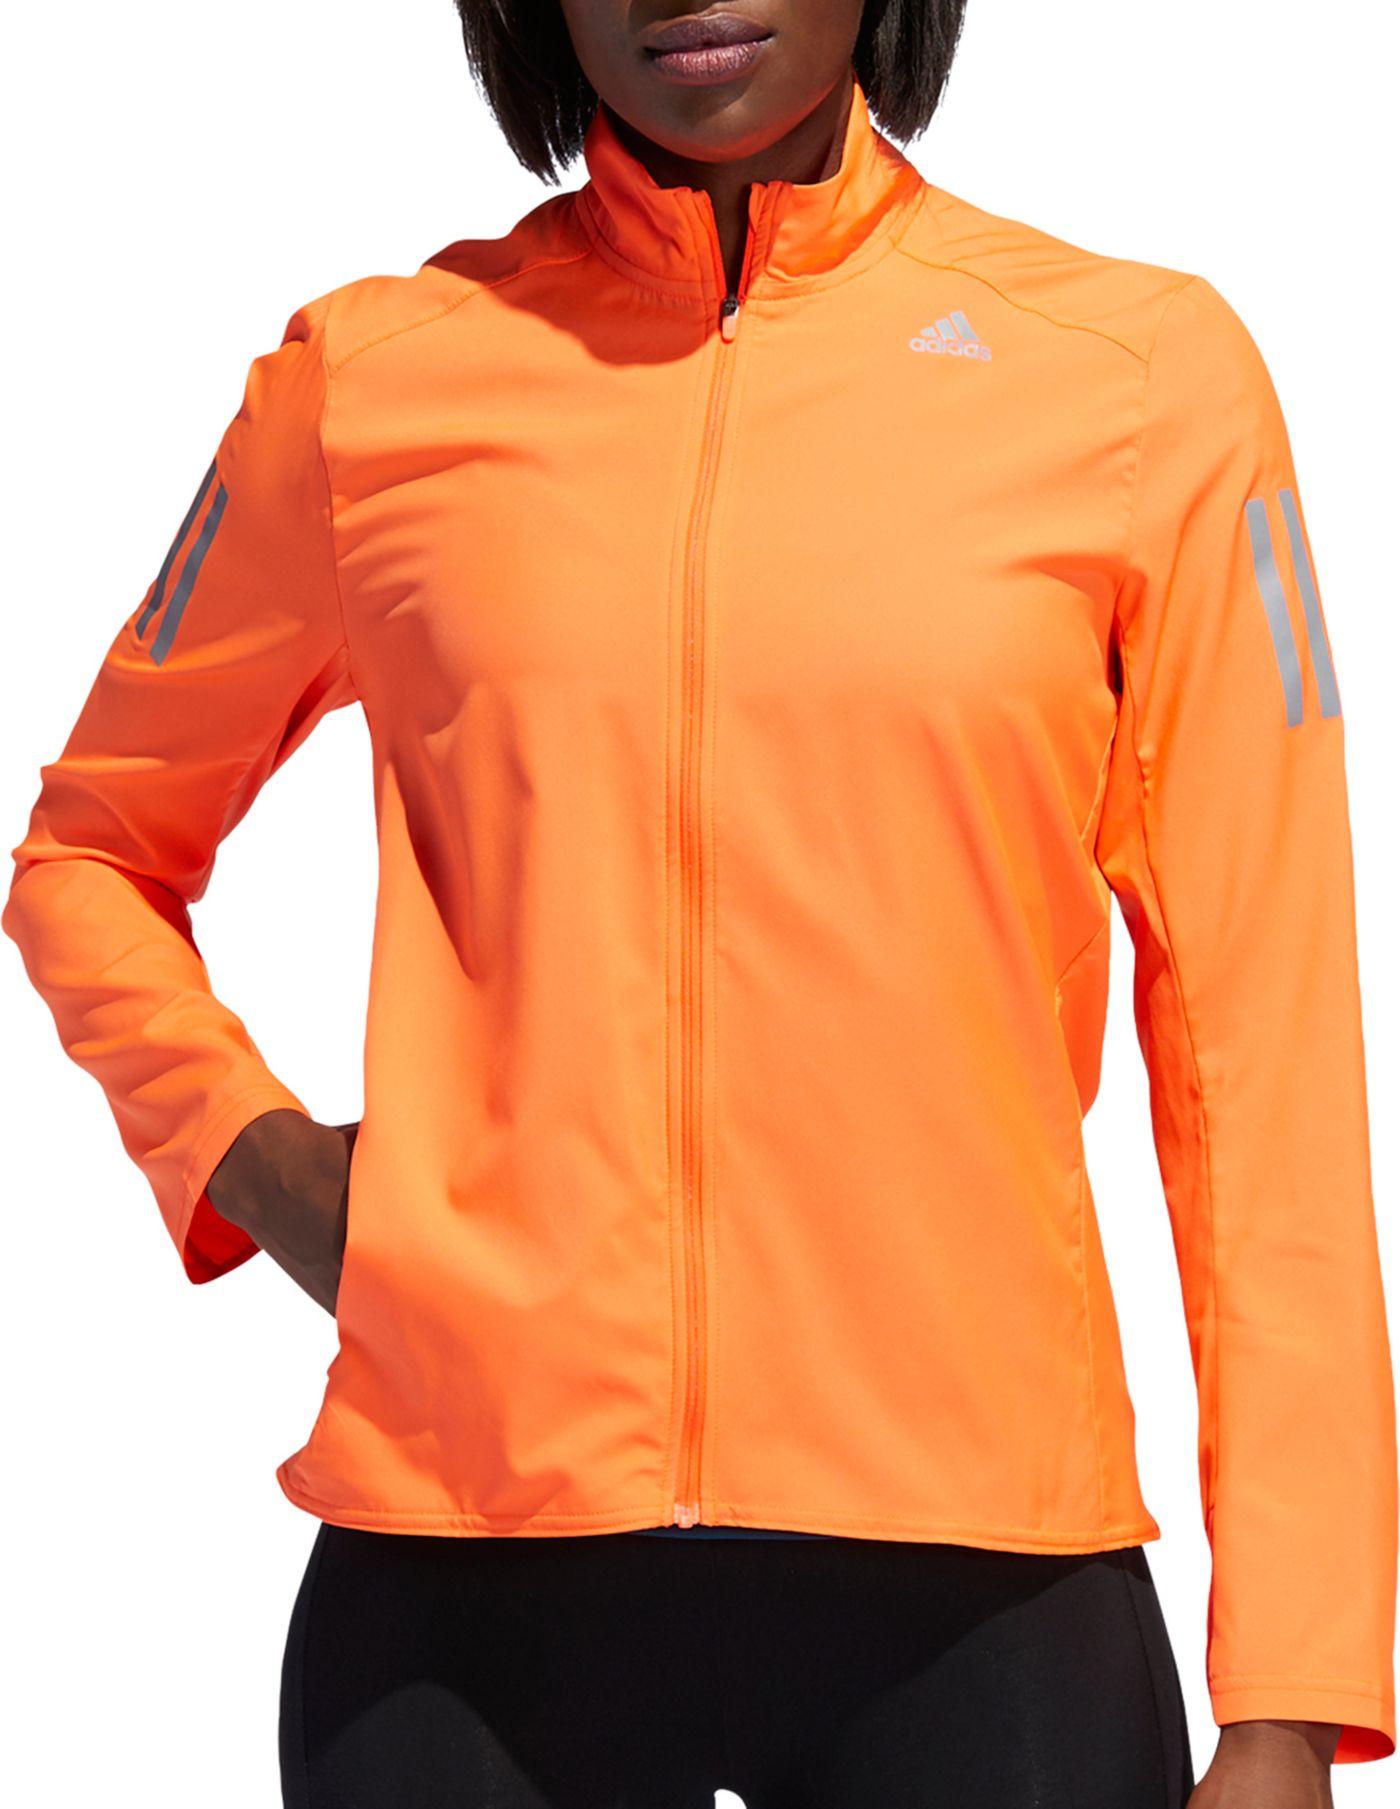 adidas Women's Own The Run Jacket